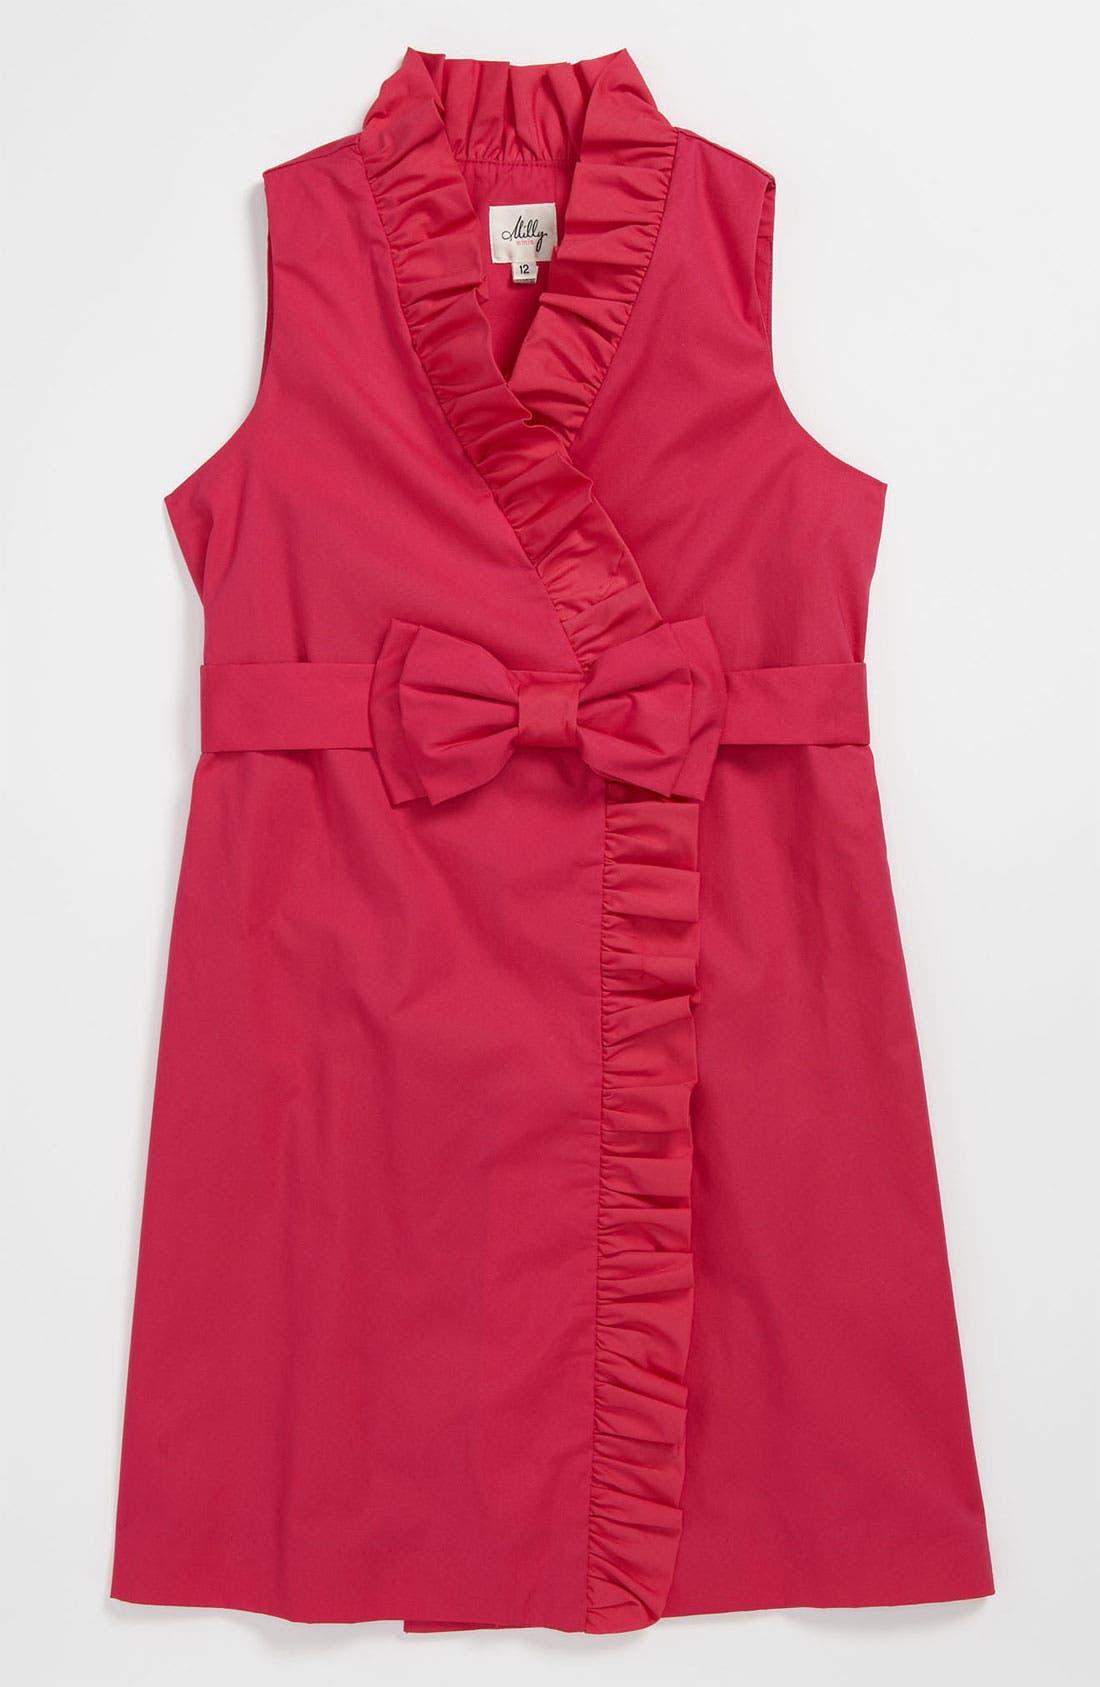 Alternate Image 1 Selected - Milly Minis Ruffle Wrap Dress (Little Girls & Big Girls)